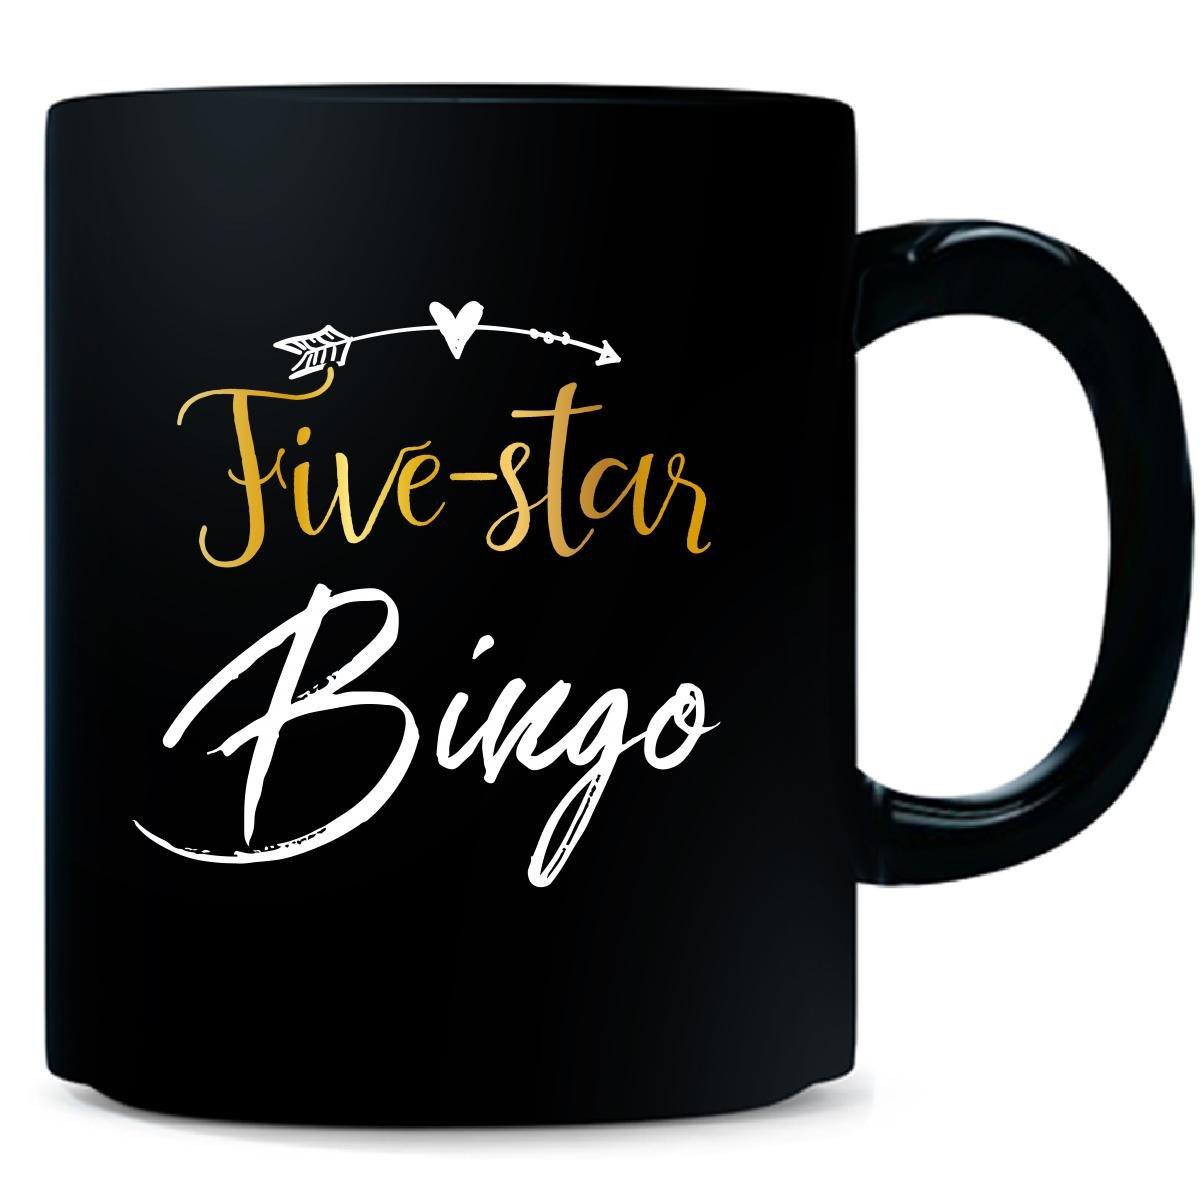 Five Star Bingo Name Mothers Day Present Grandma - Mug